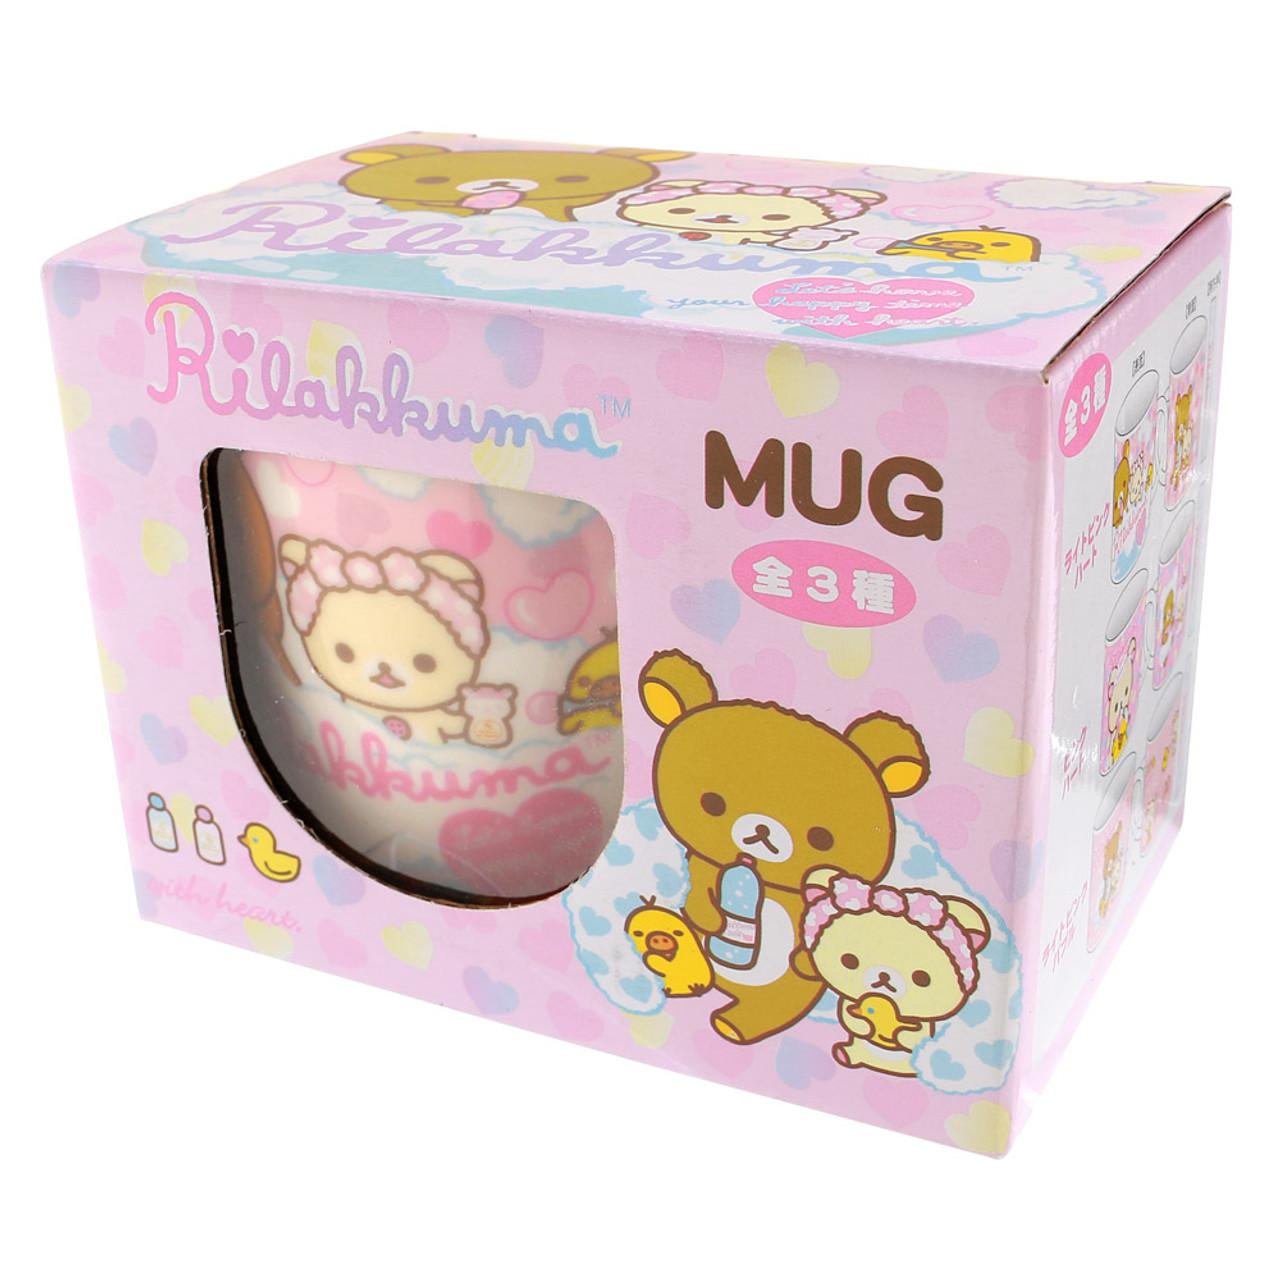 San-x Rilakkuma Bath Time Light Pink Ceramic Mug - Heart ( Box View )